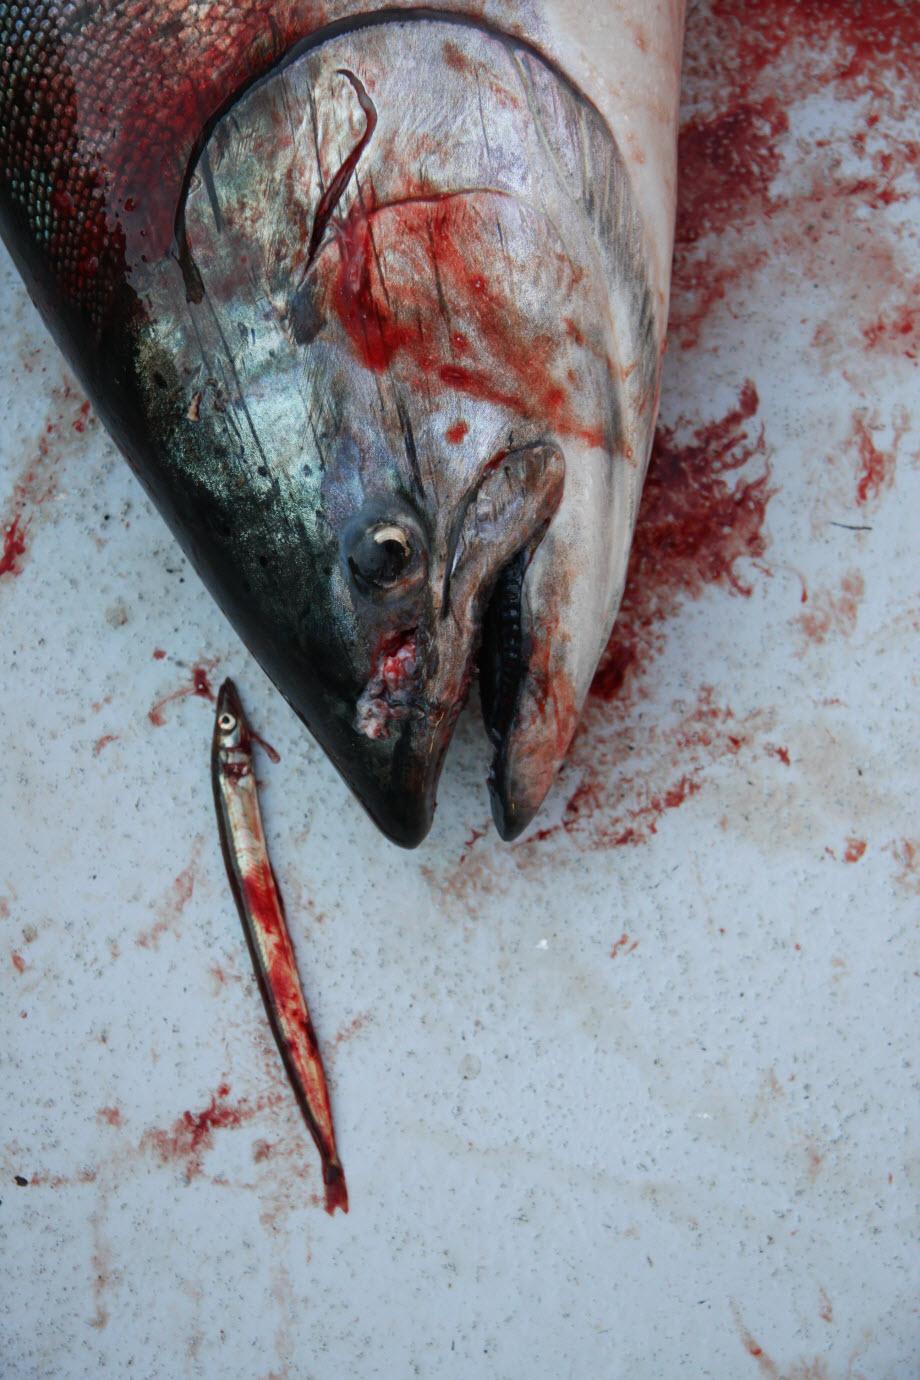 WestCoastFish3387